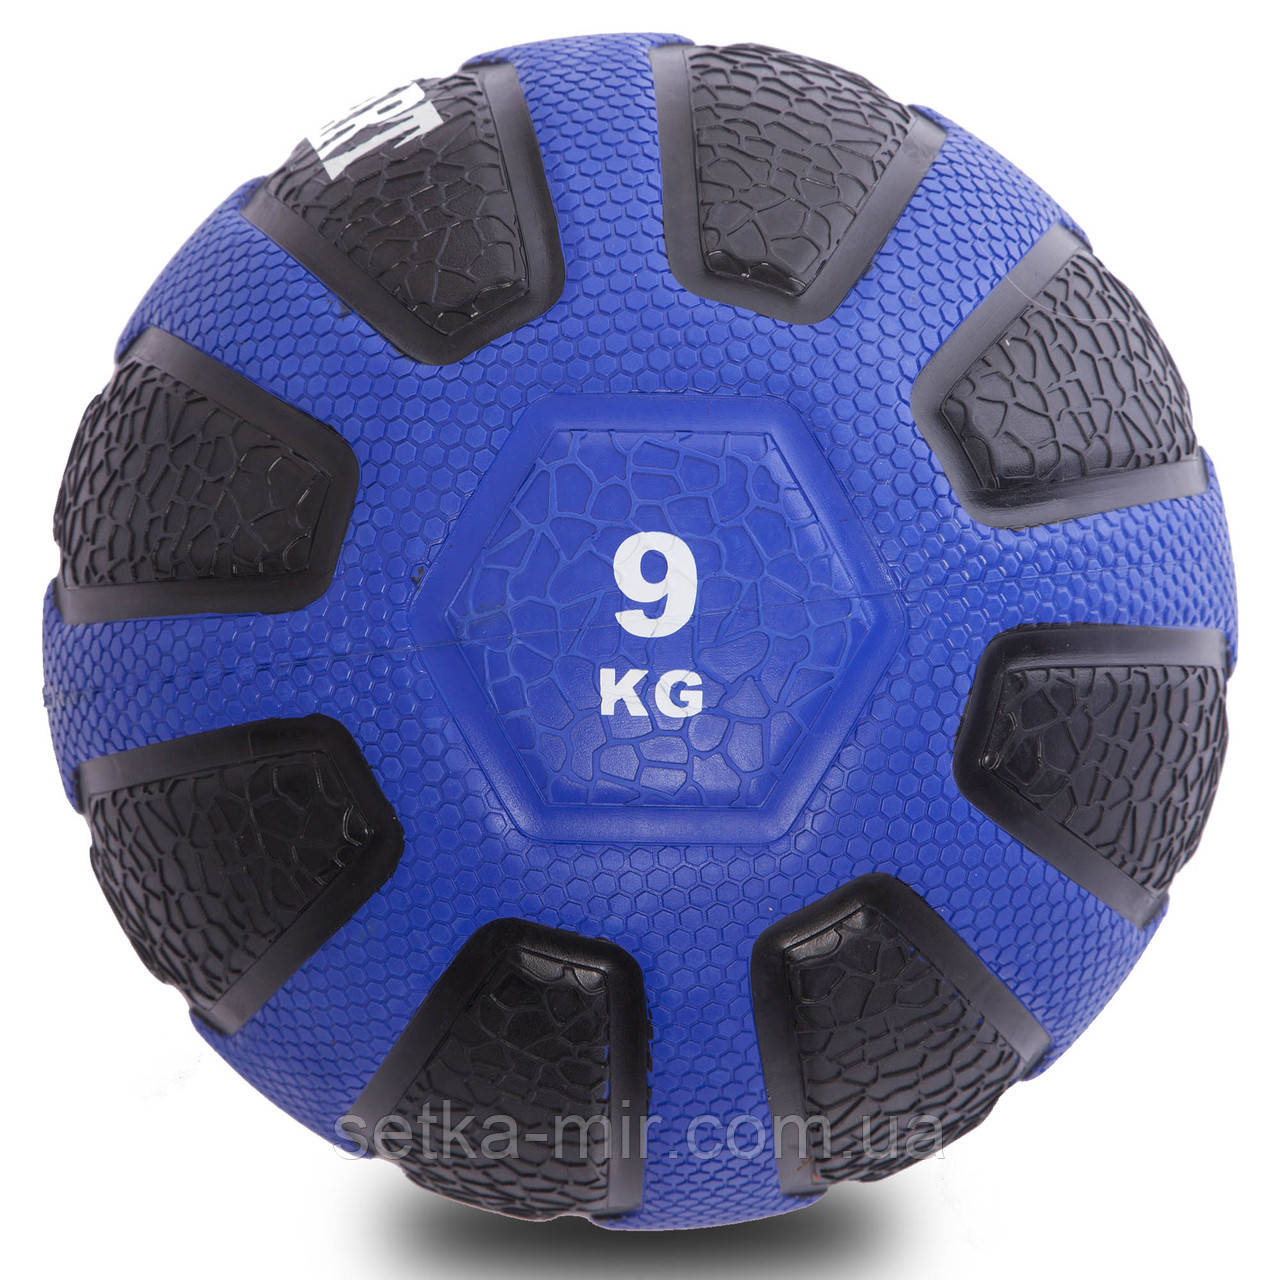 М'яч медичний медбол Zelart Medicine Ball FI-0898-9 9кг